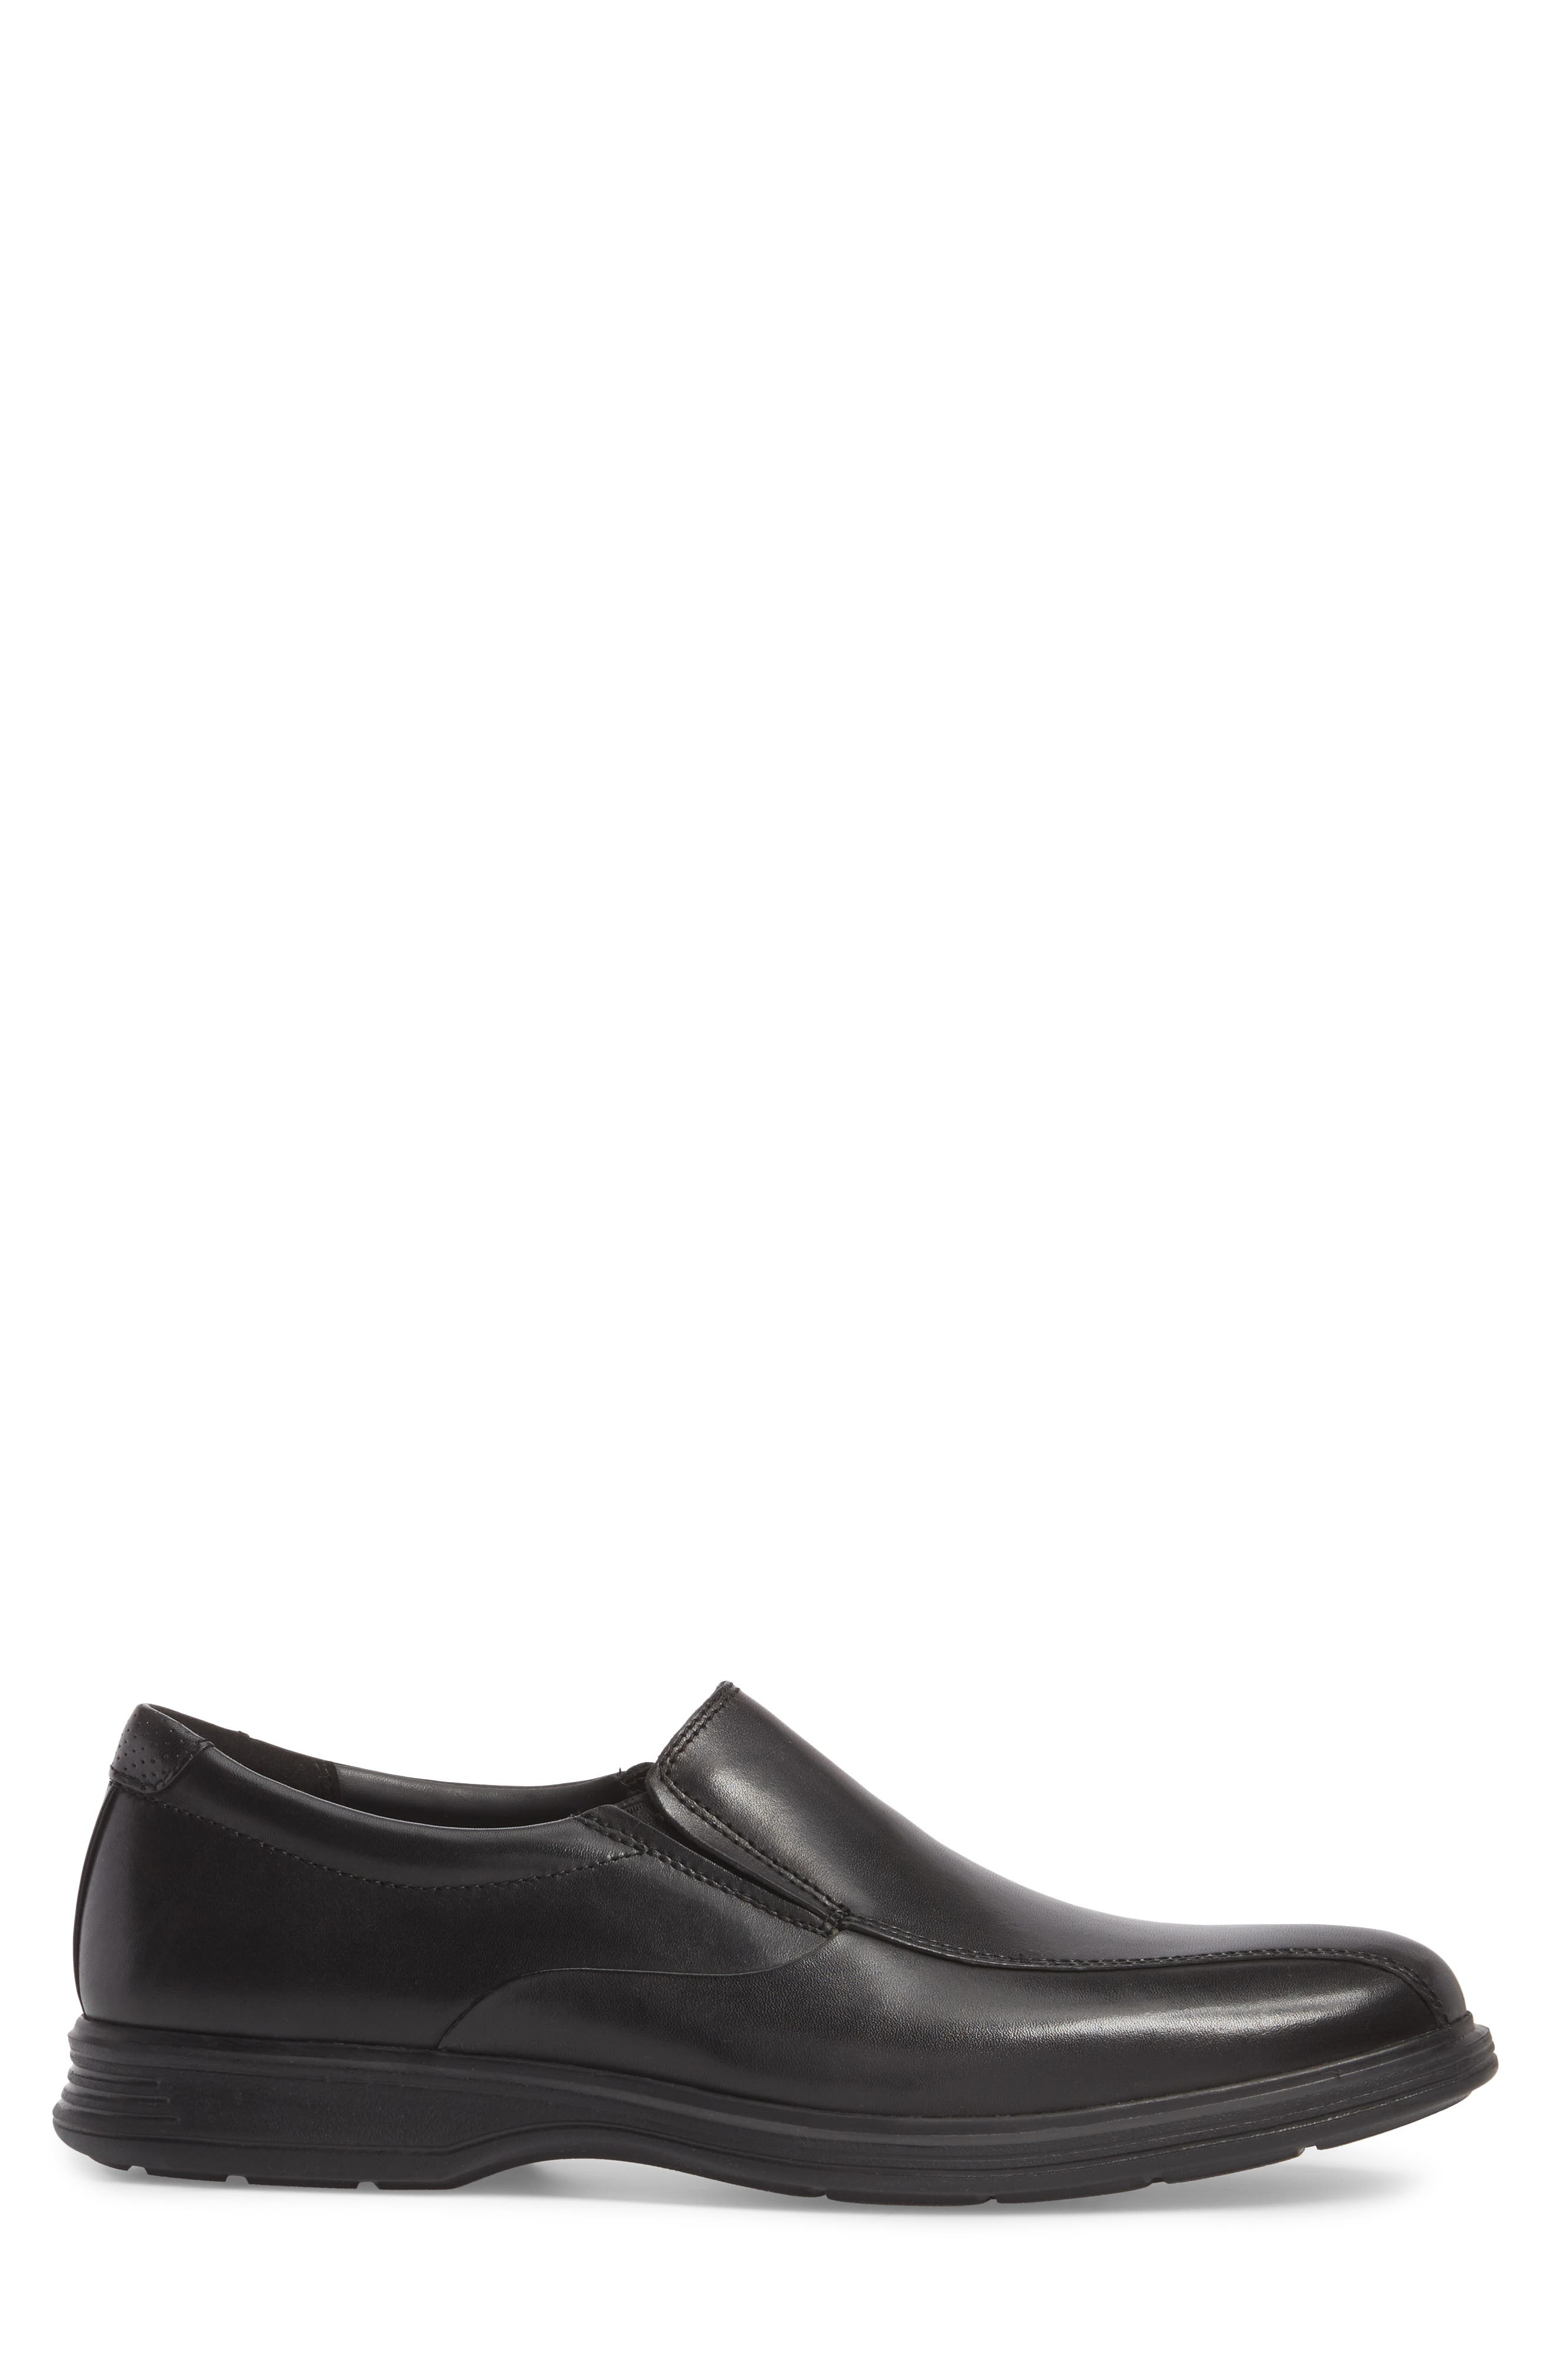 Dressports 2 Lite Venetian Loafer,                             Alternate thumbnail 3, color,                             BLACK LEATHER